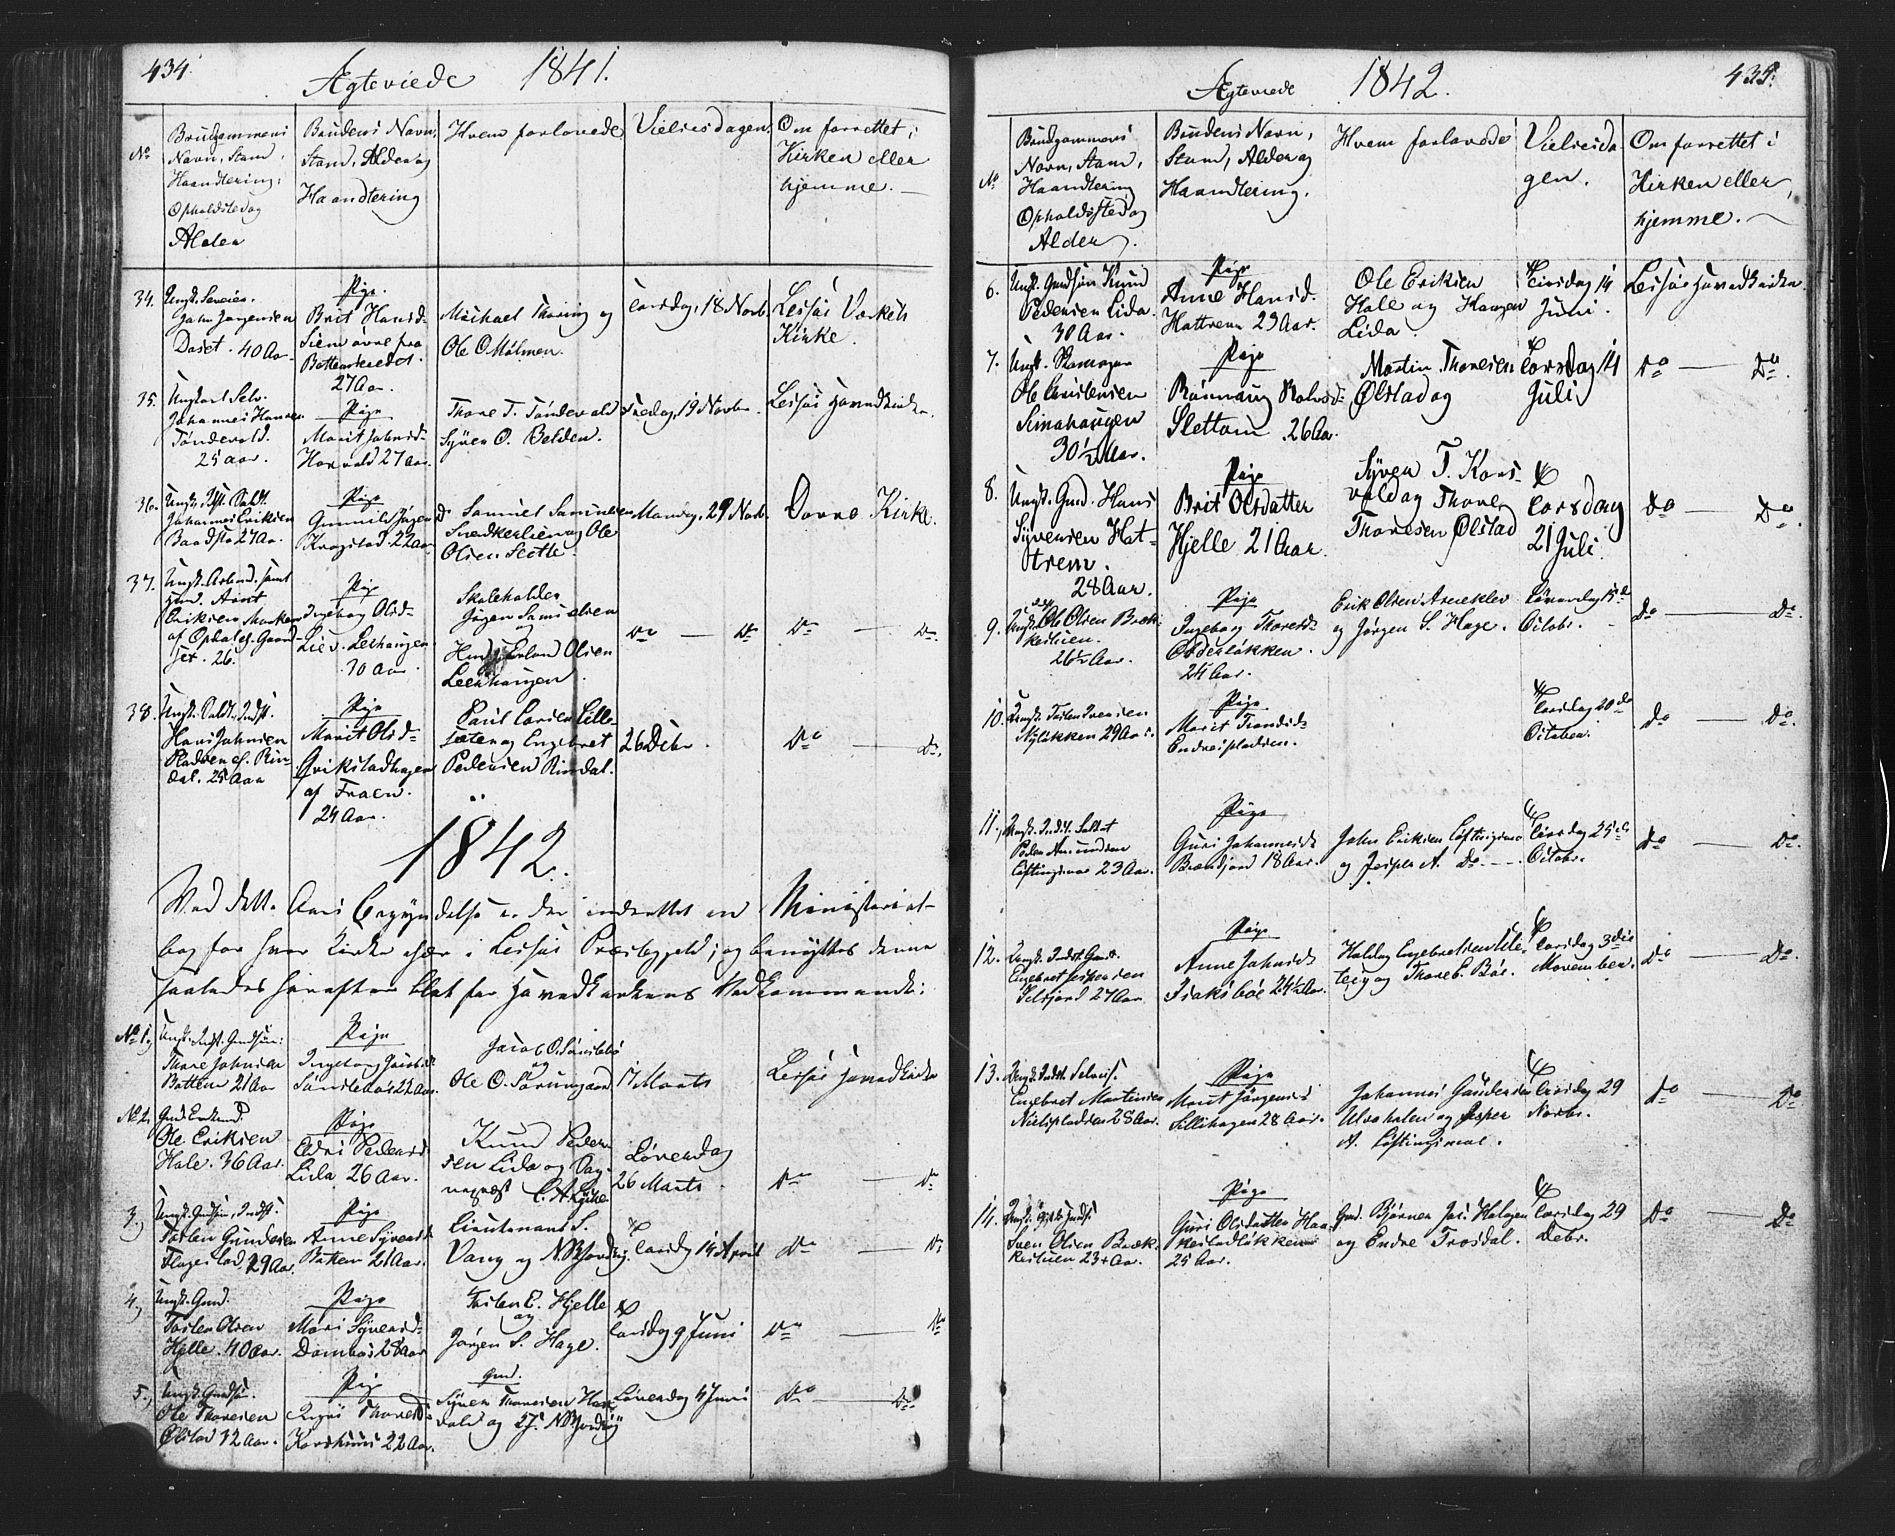 SAH, Lesja prestekontor, Klokkerbok nr. 2, 1832-1850, s. 434-435